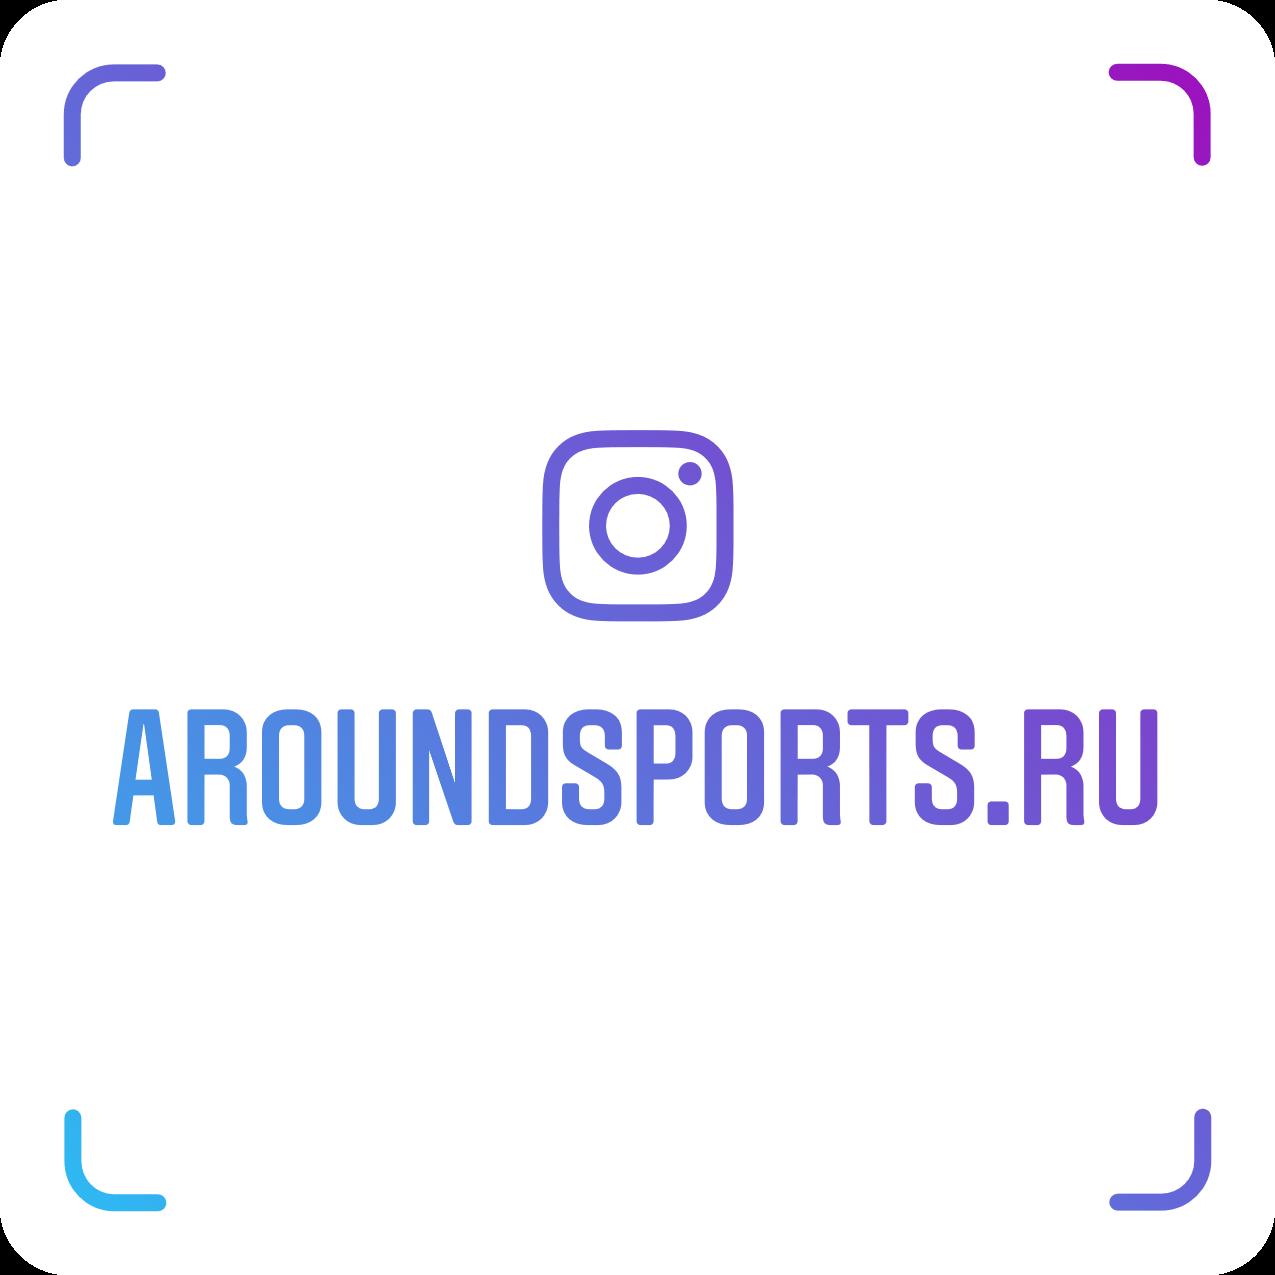 aroundsports.ru